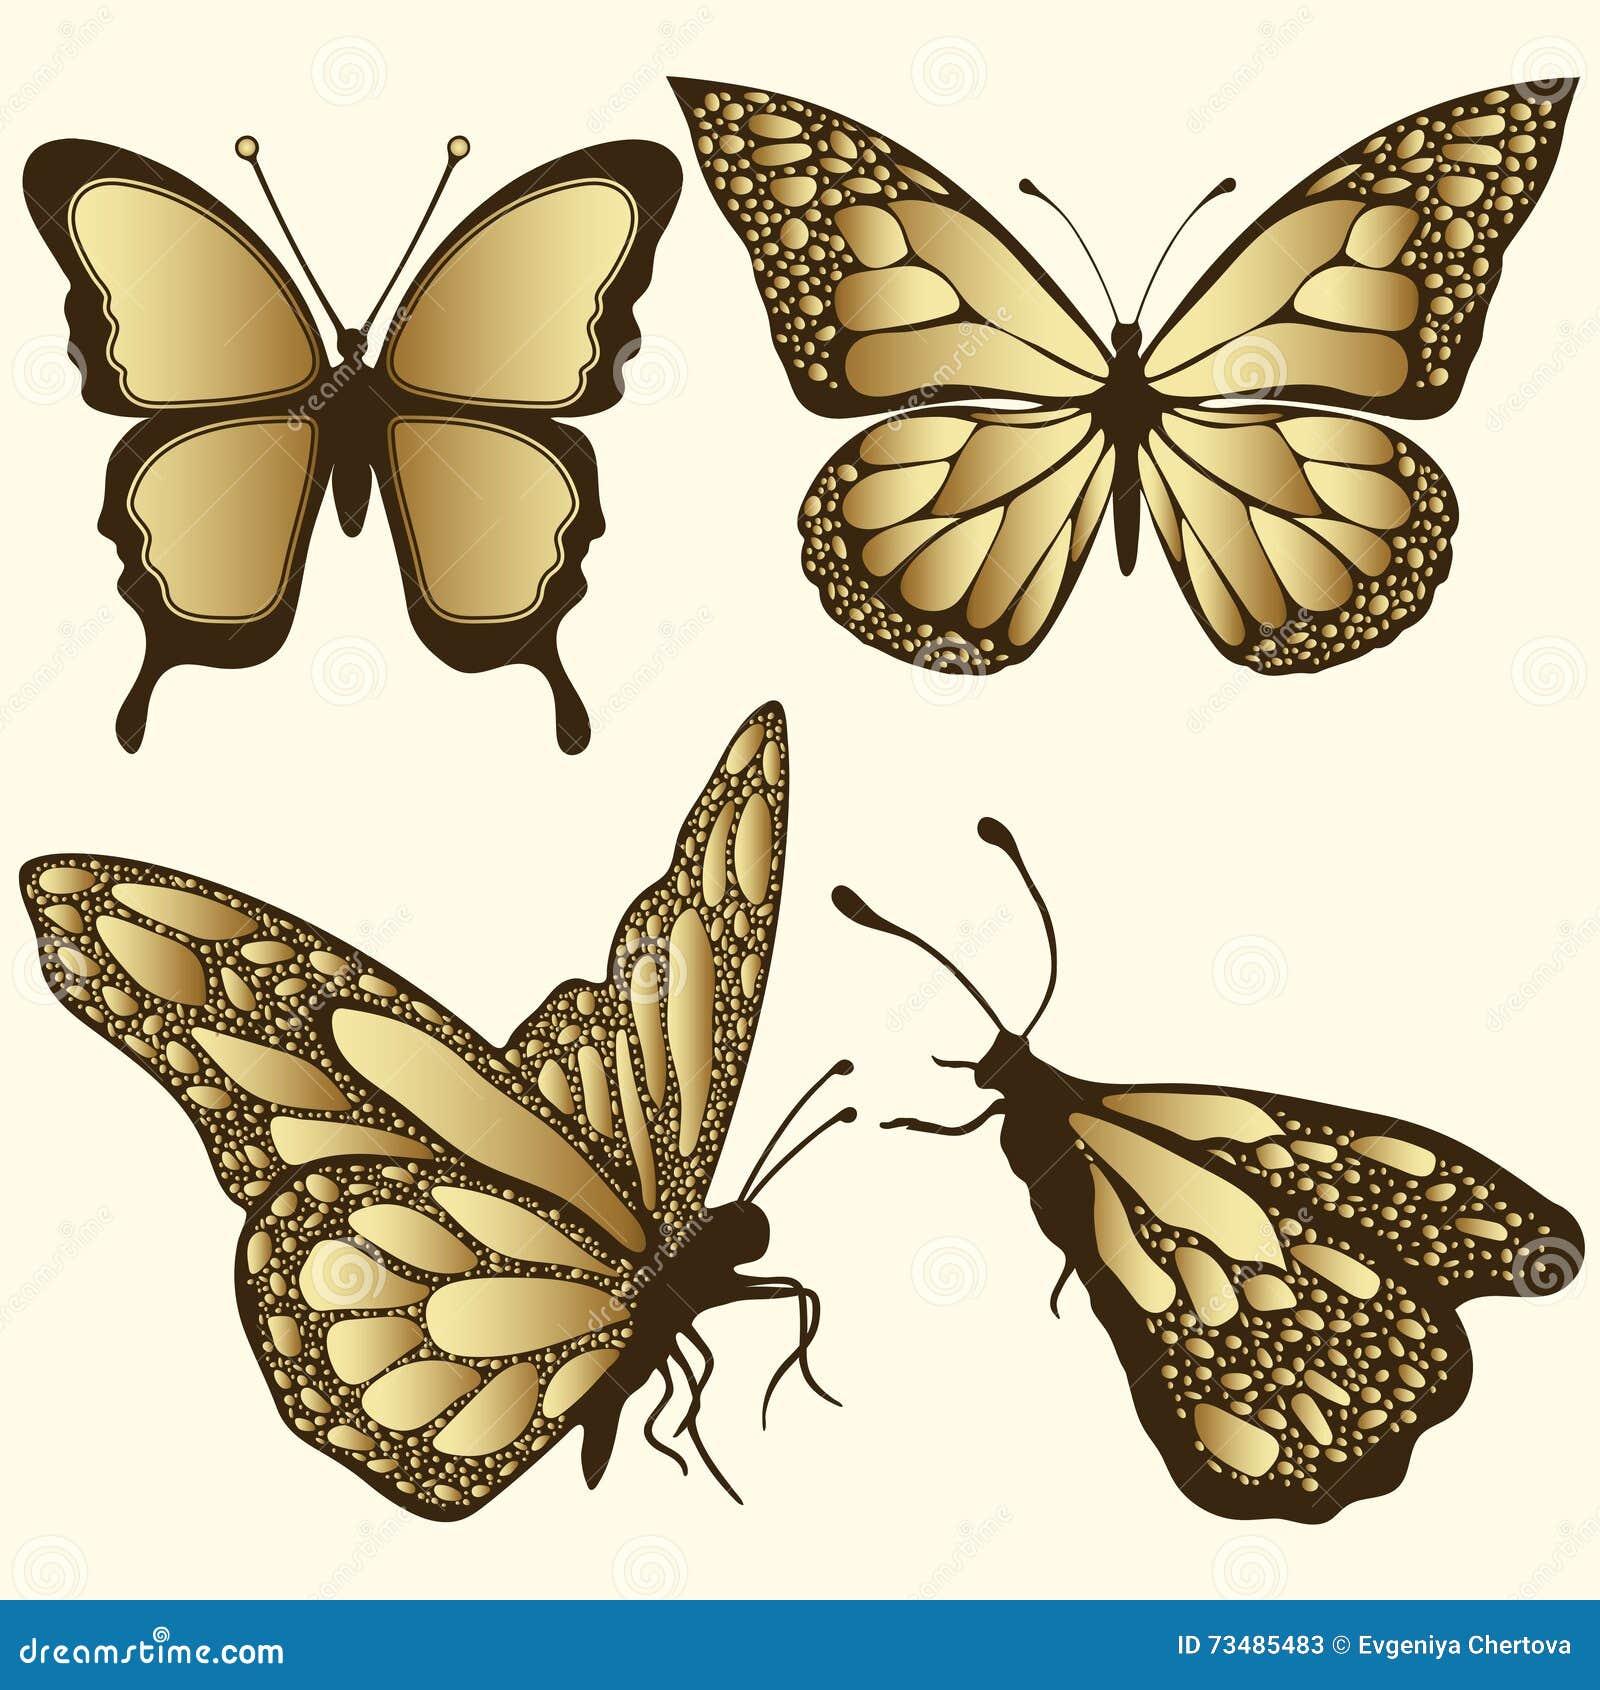 Grupo dourado da borboleta Projeto luxuoso, joia cara, broche Inseto modelado exótico, tatuagem, elemento decorativo Vetor Illust